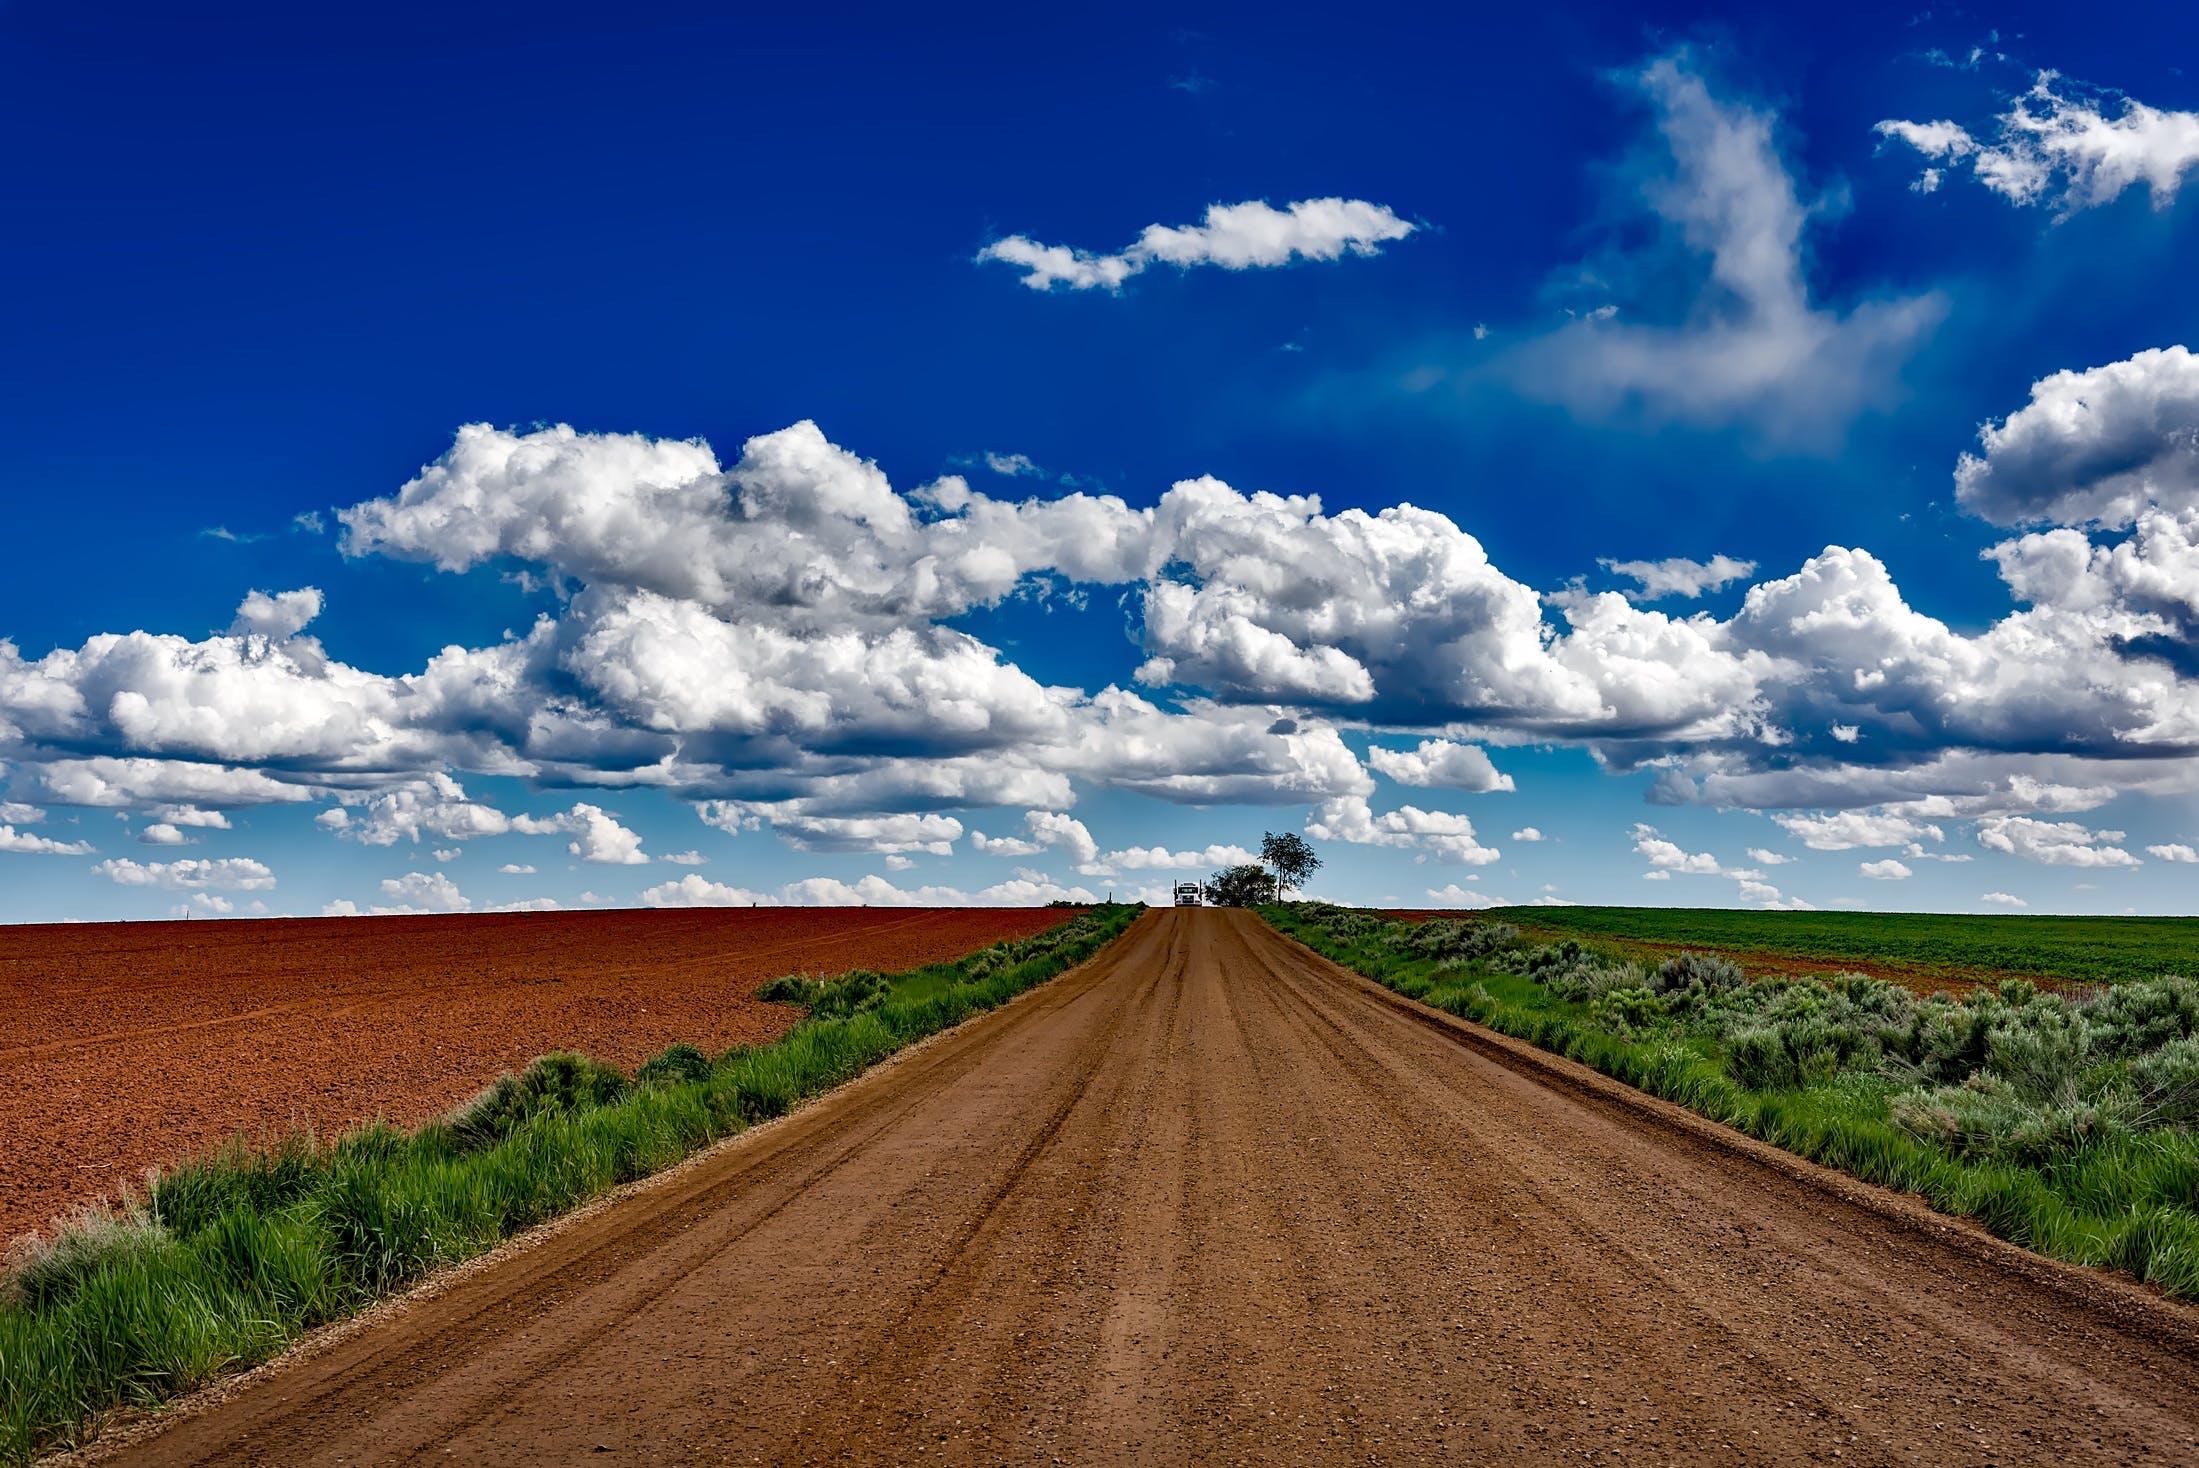 Бесплатное стоковое фото с грязная дорога, дорога, небо, облака